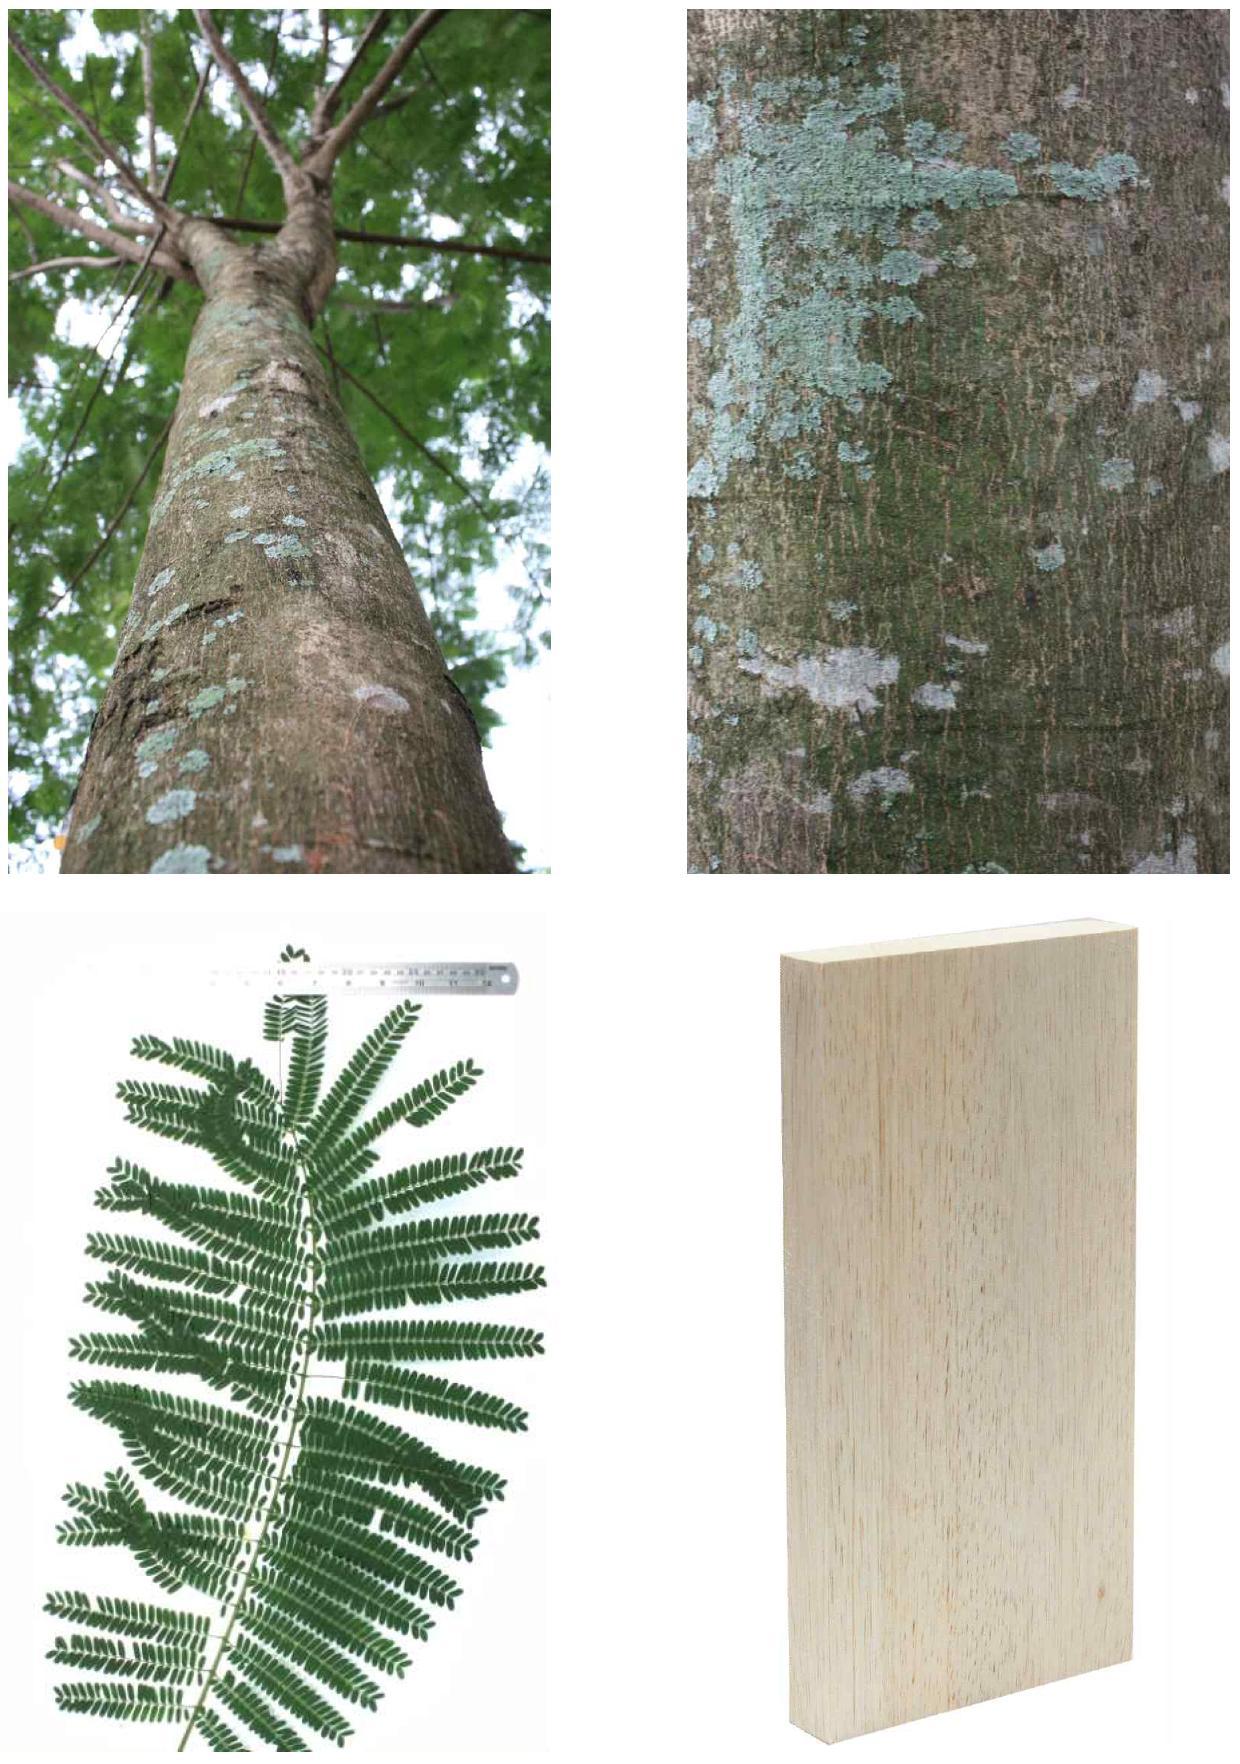 Albizia의 전체수형, 수피, 잎 및 재면.